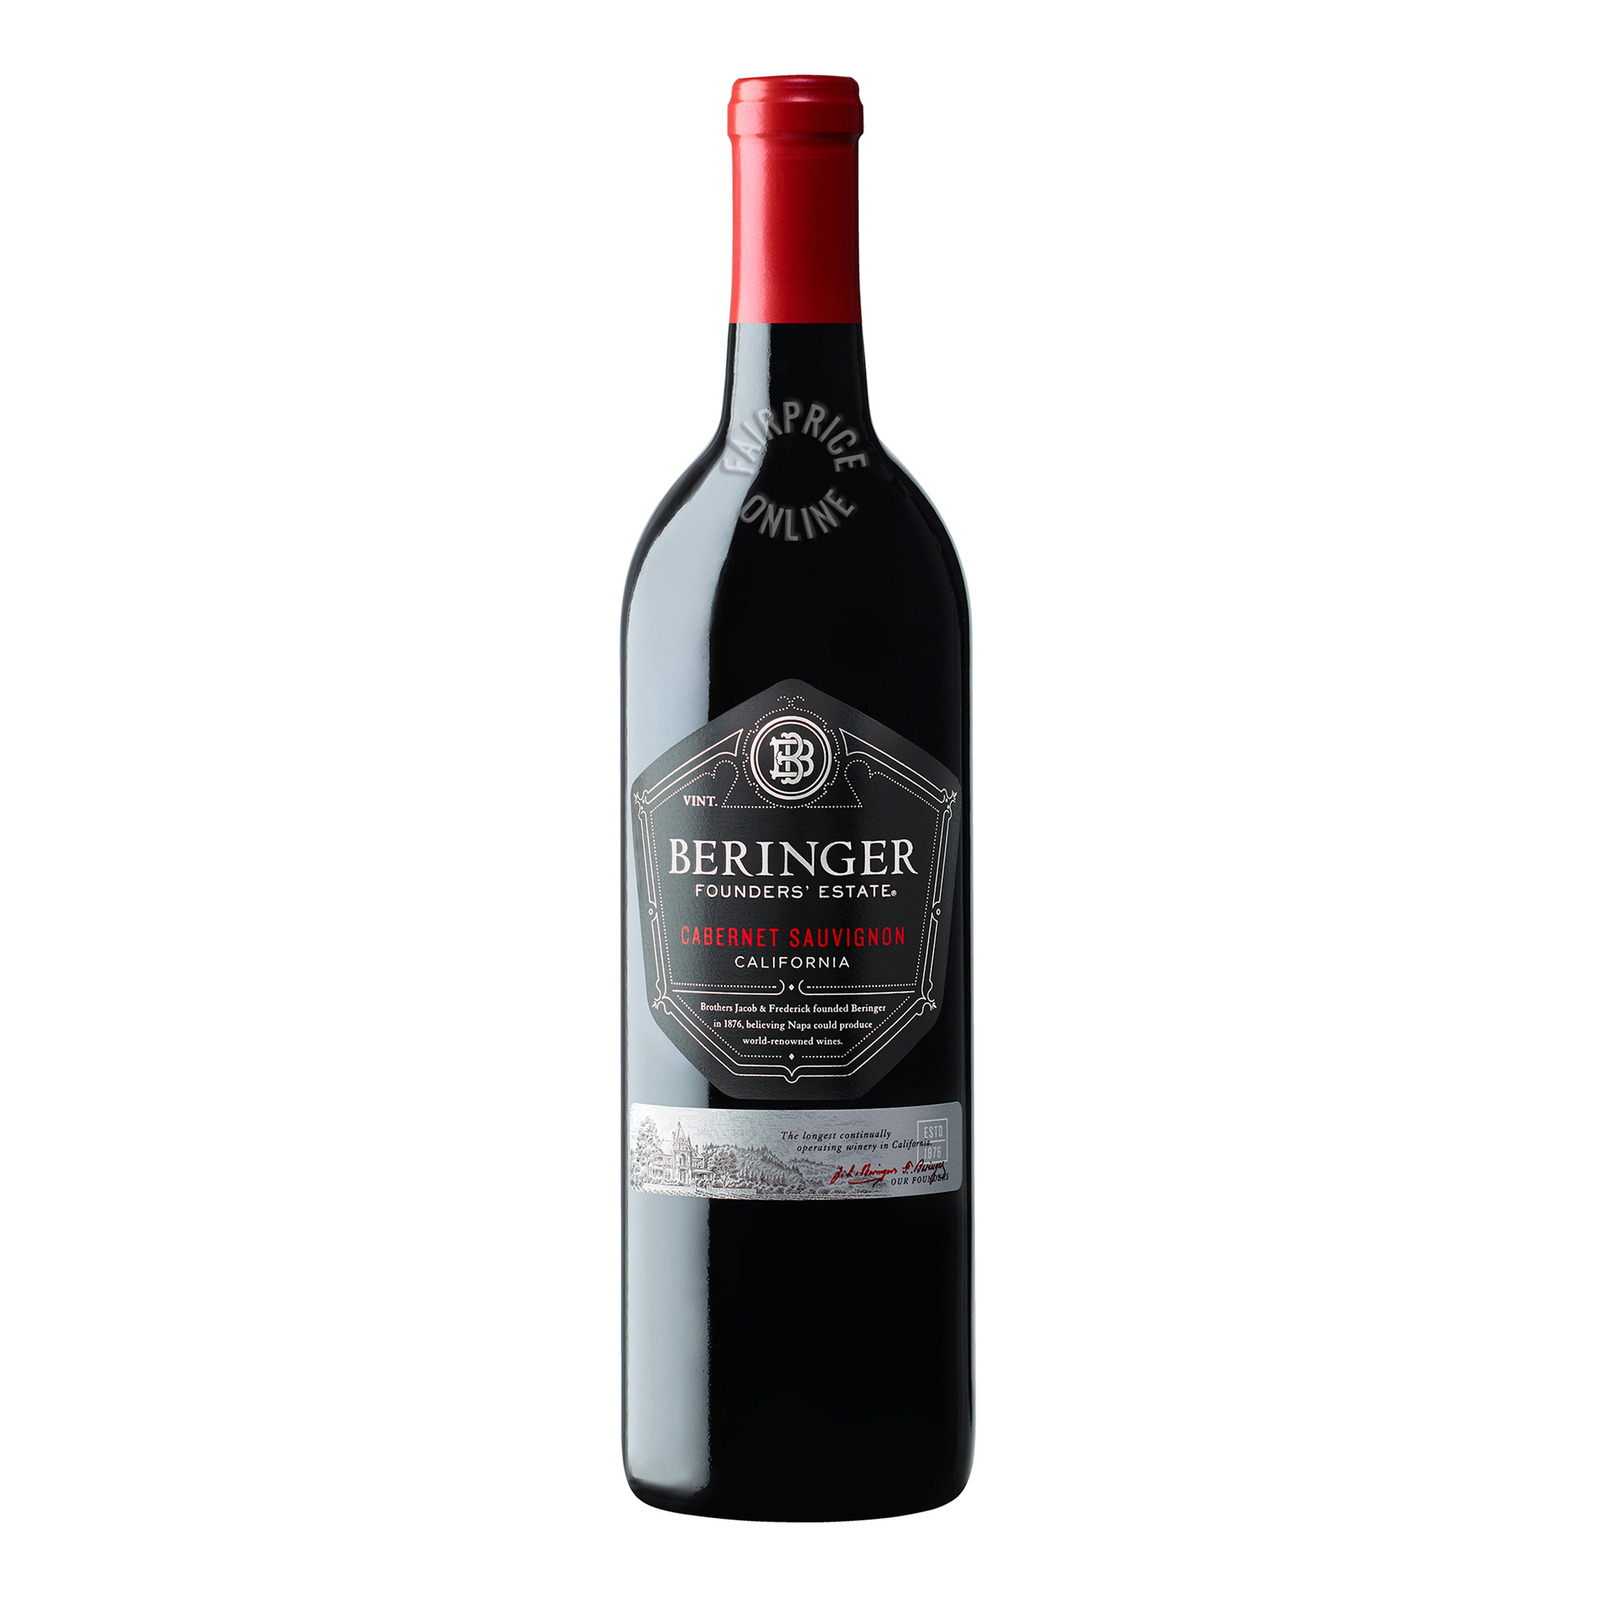 Beringer Founders' Estate Red Wine - Cabernet Sauvignon